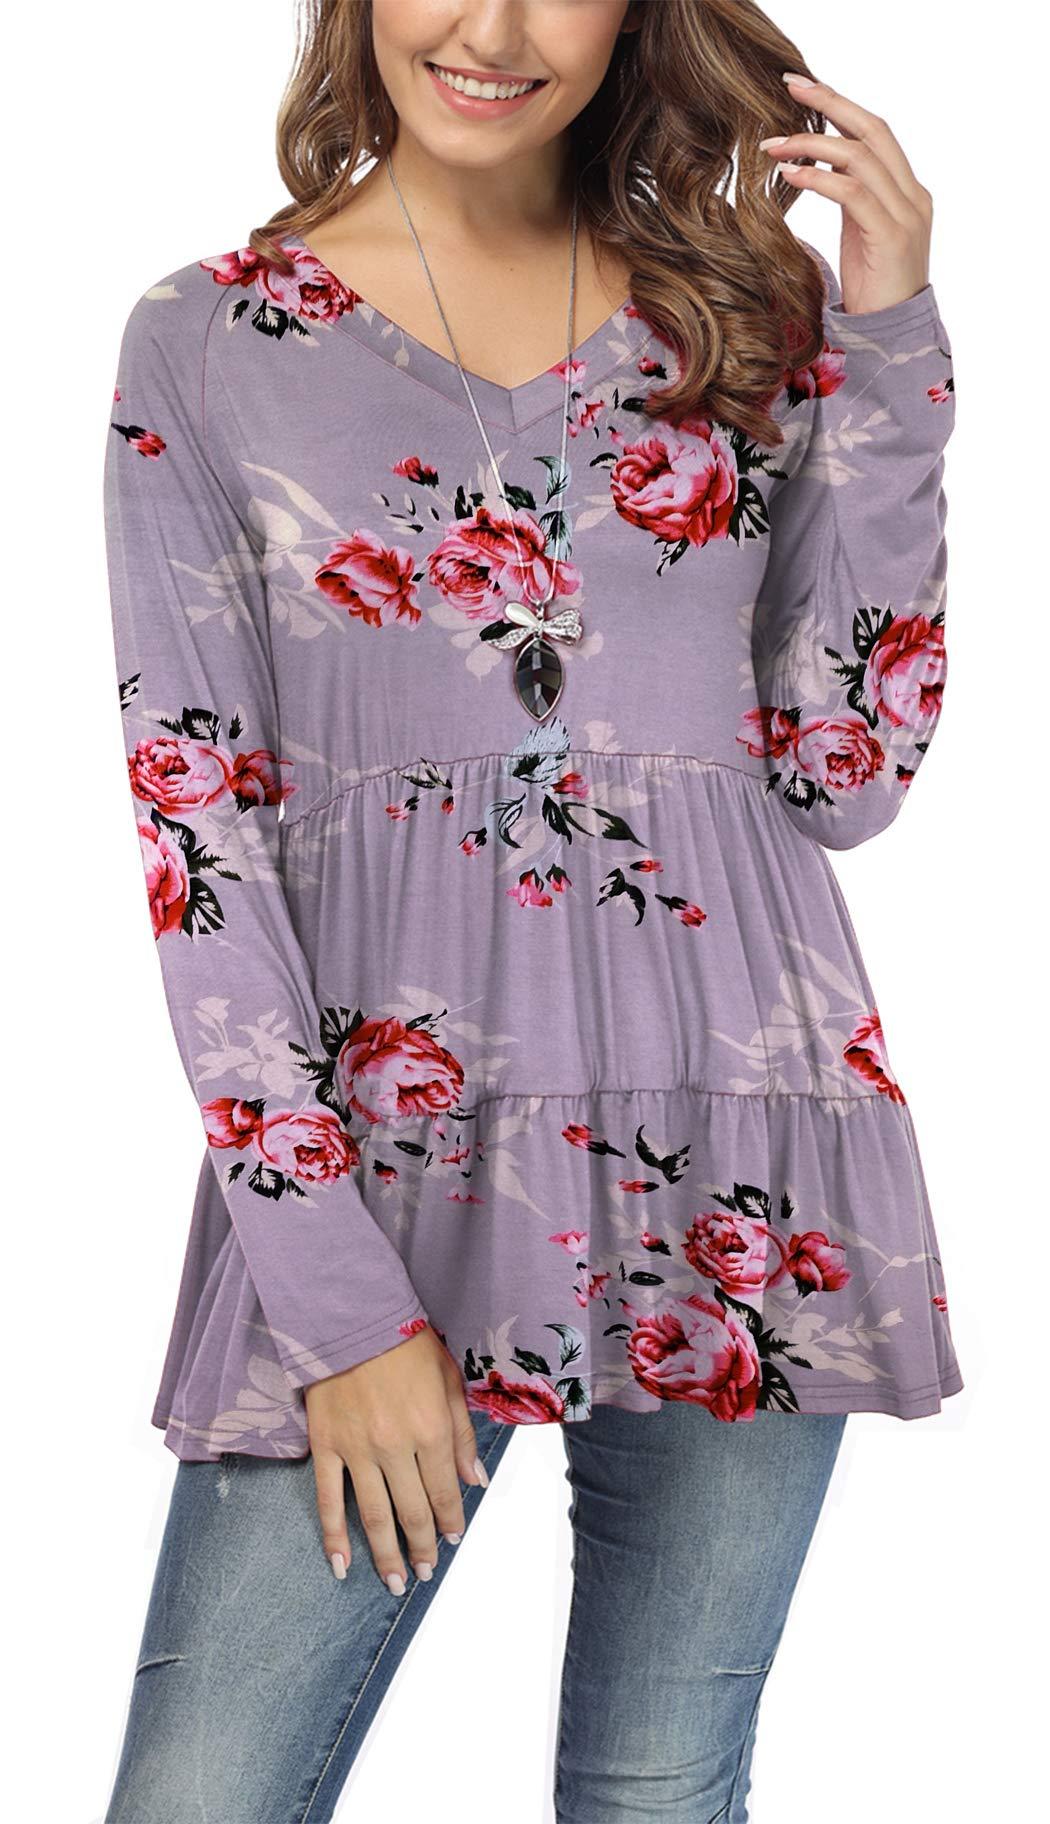 iGENJUN Women's Casual Long Sleeve Ruffle Loose Swing Tunic Floral Tops,DG4,S